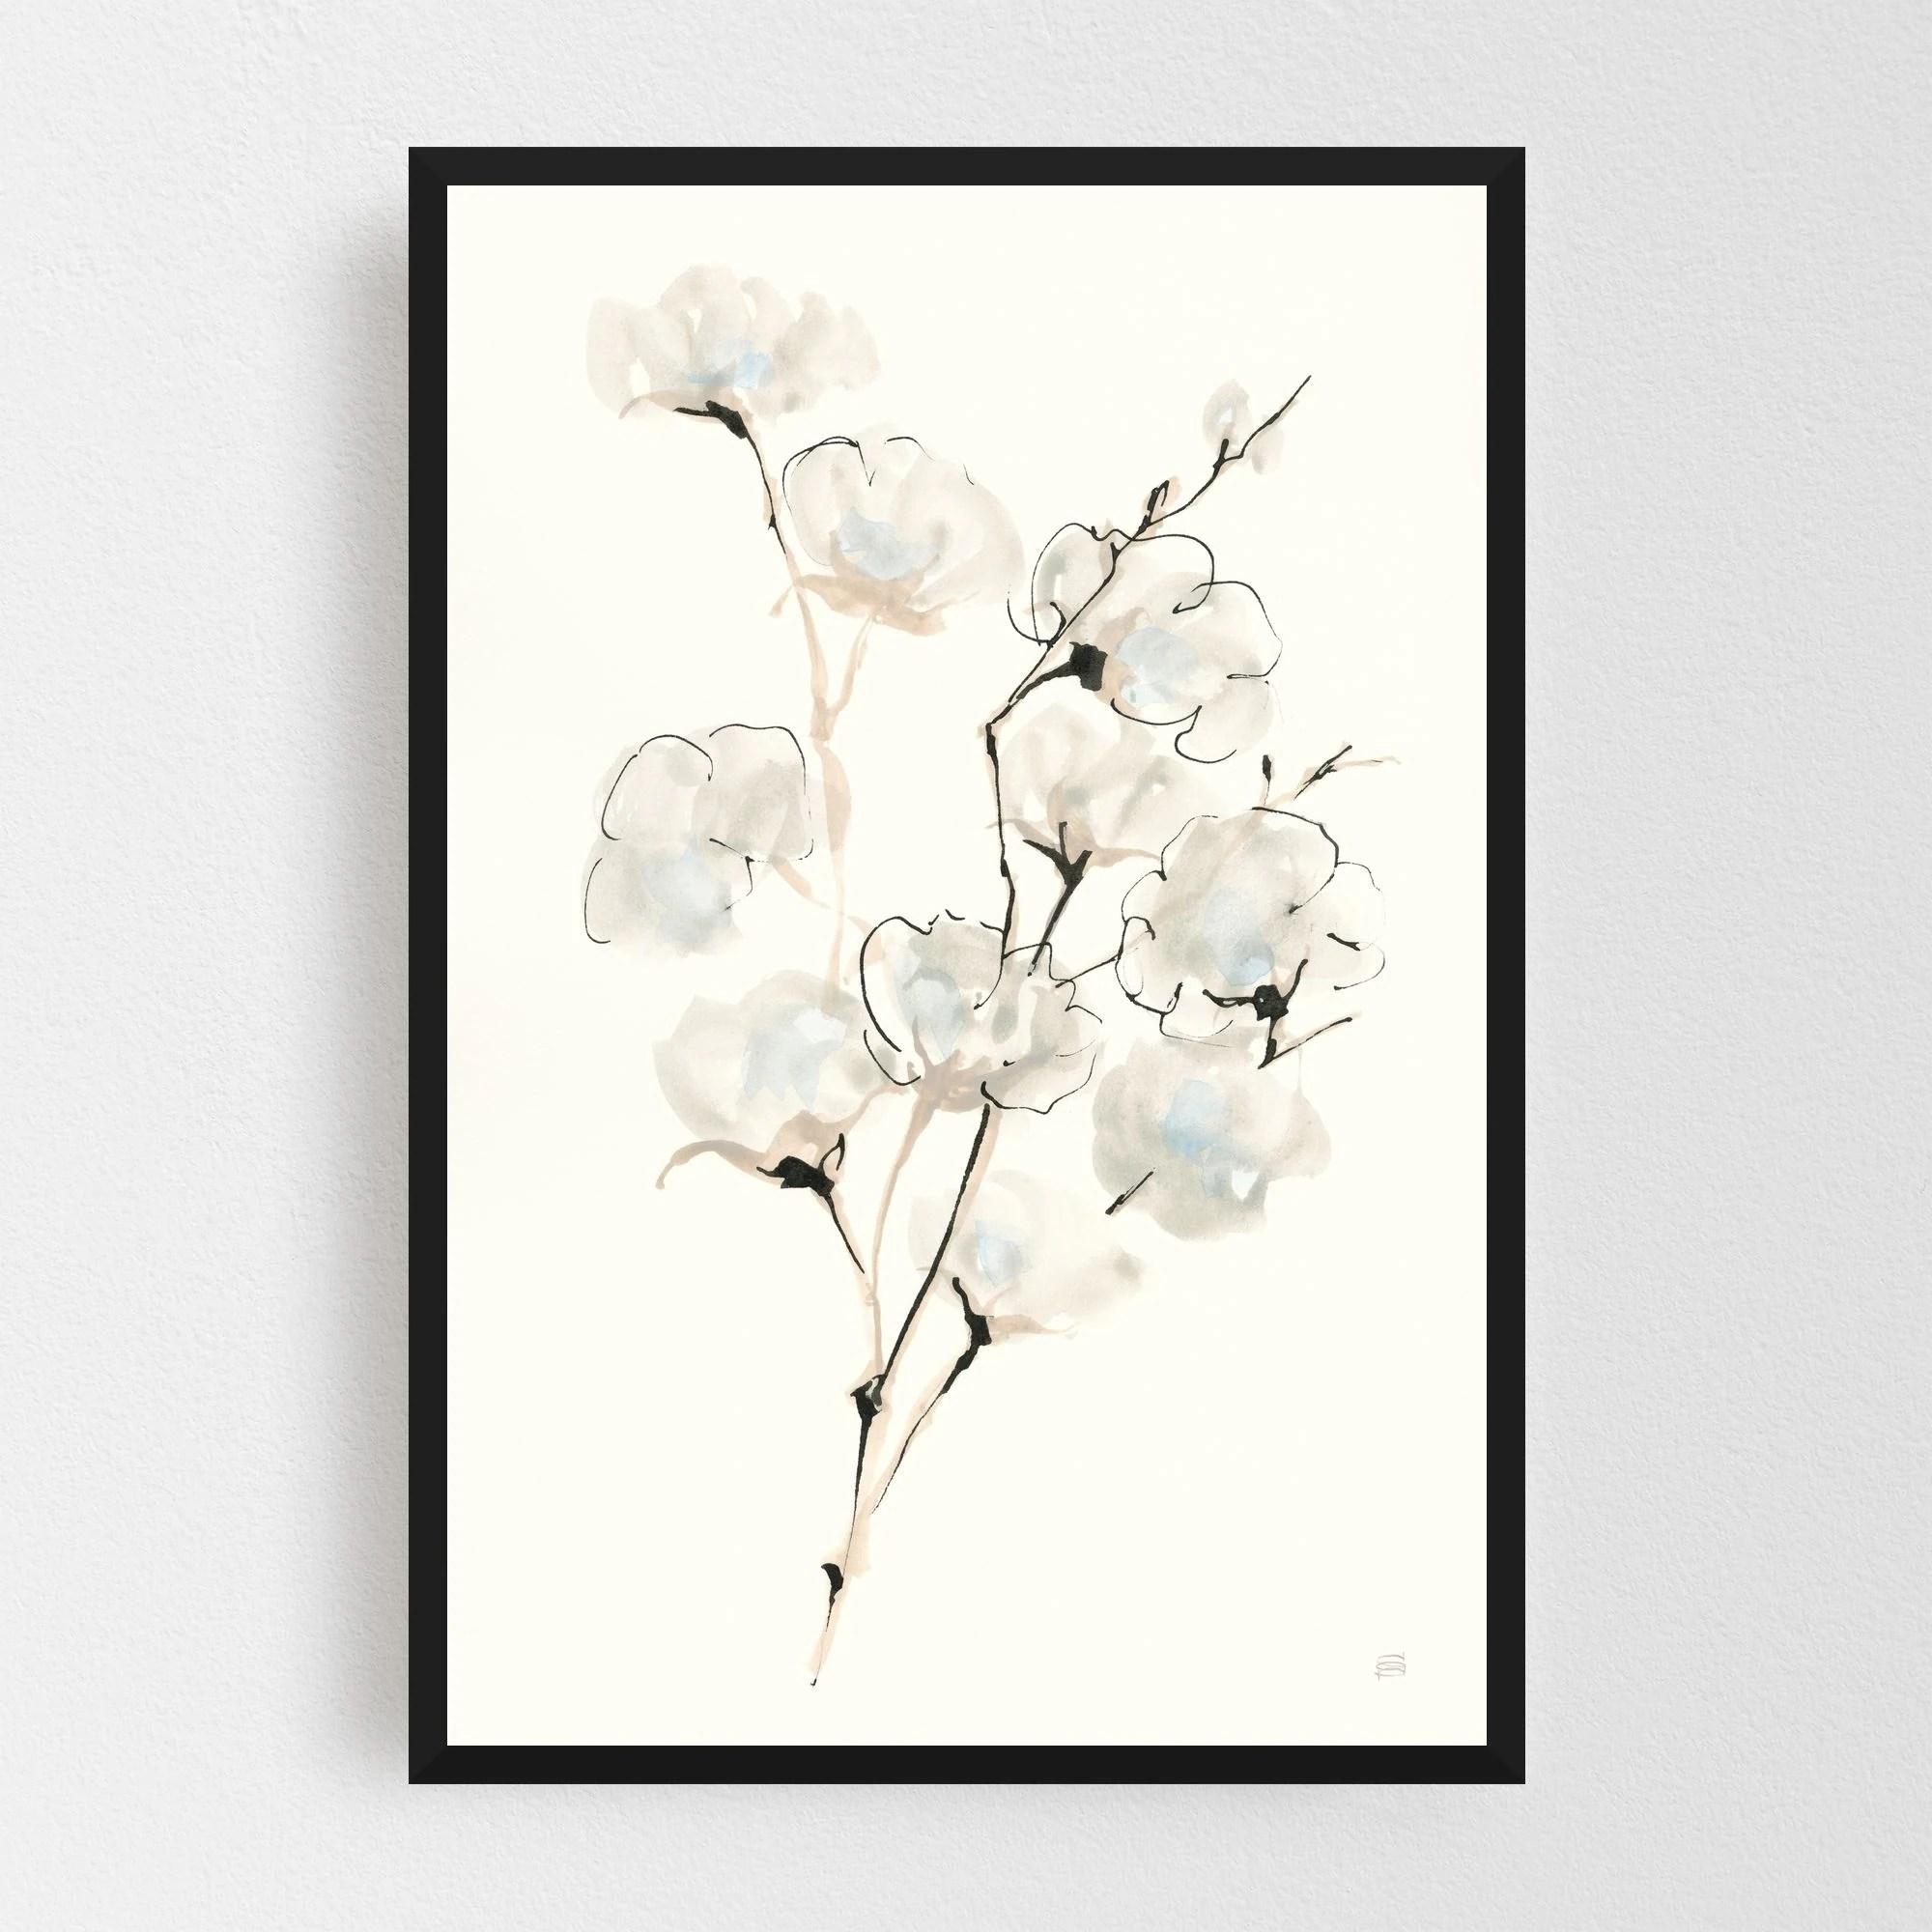 Noir Gallery Minimal Rural Floral Illustration Framed Art Print